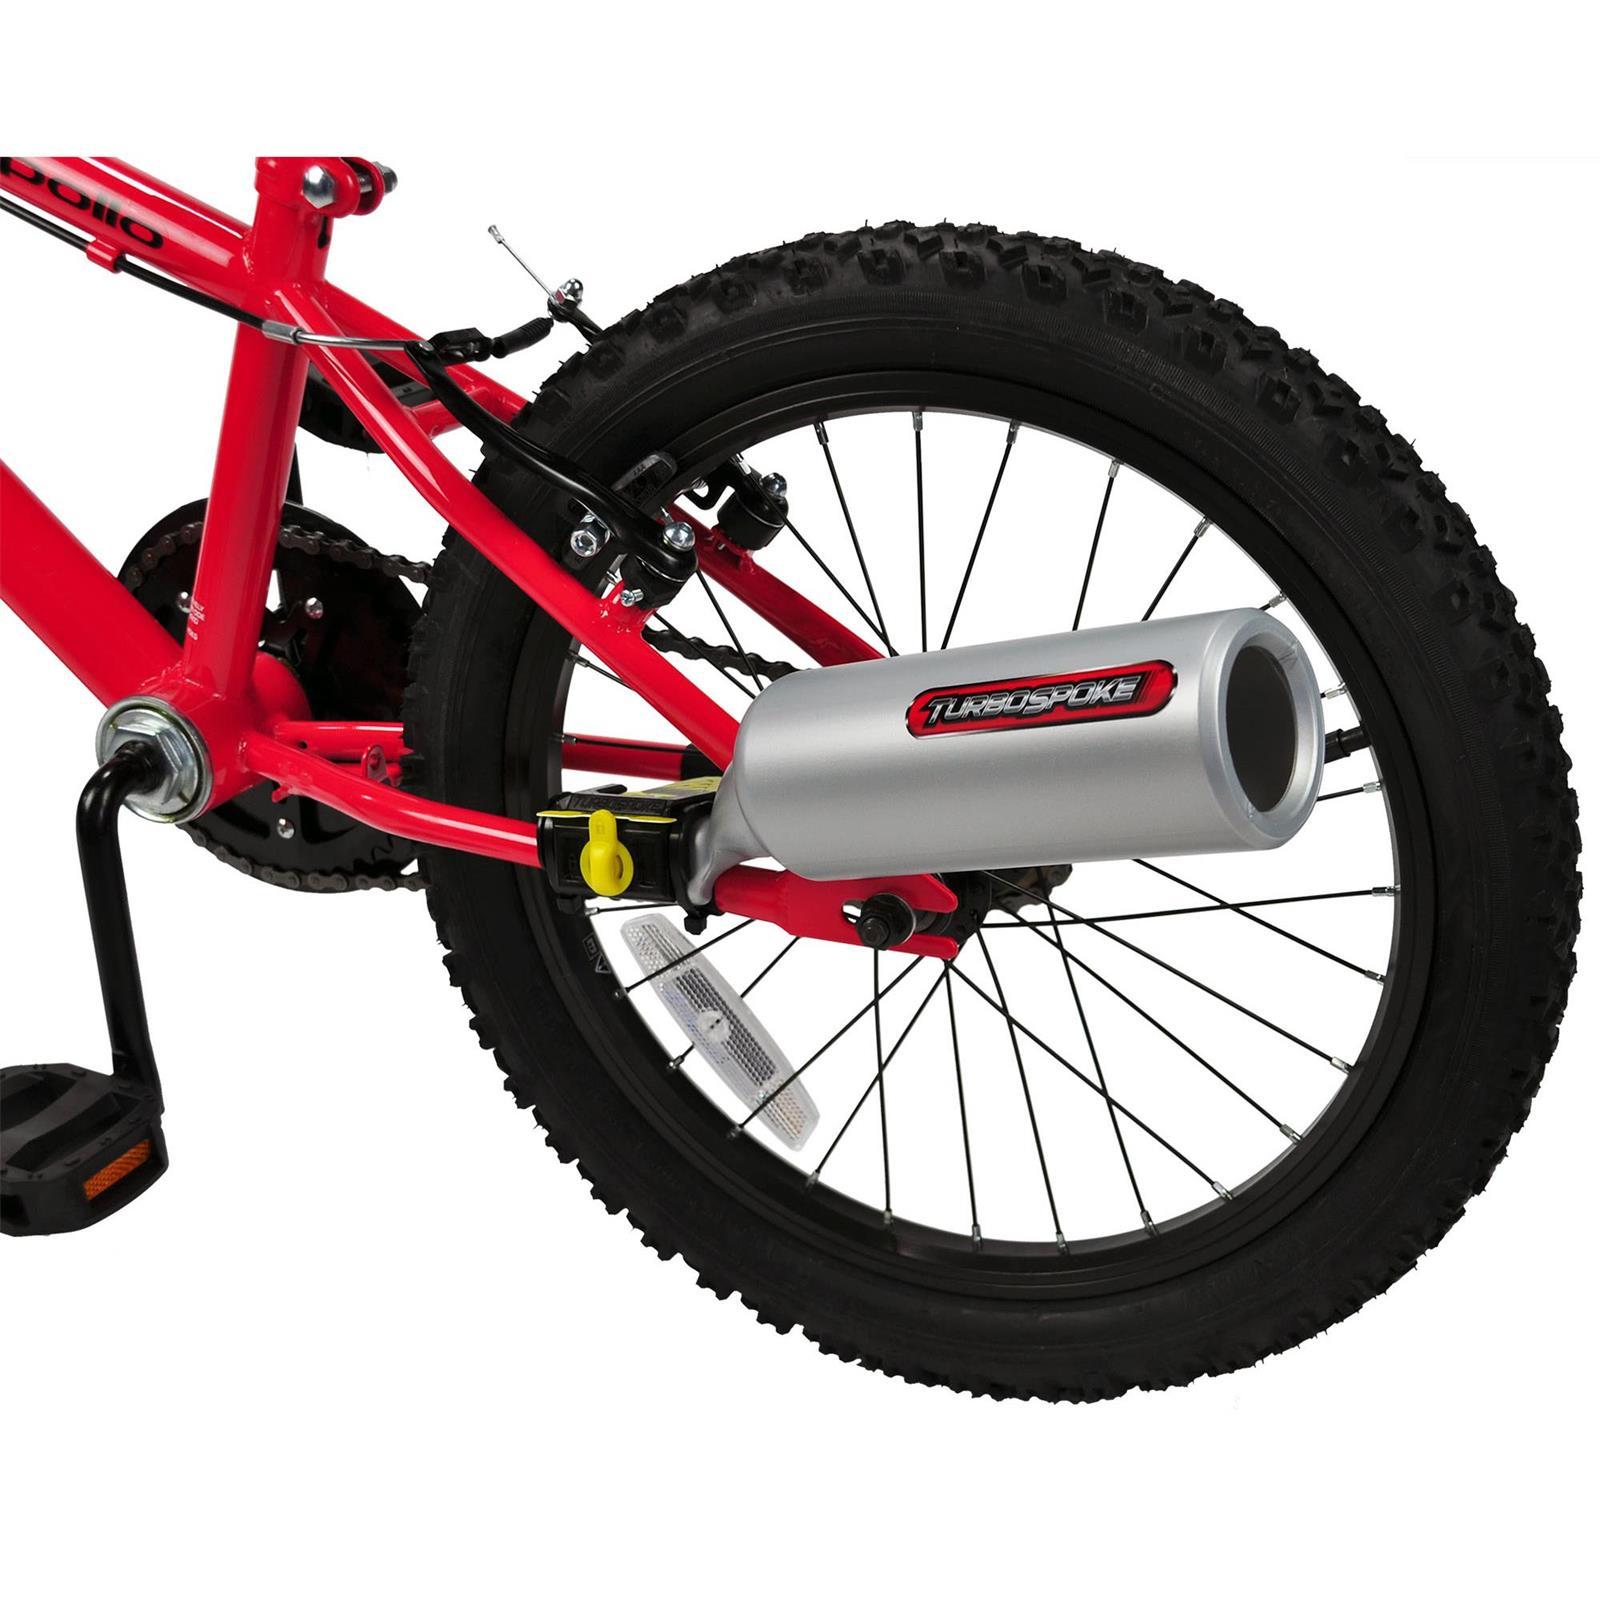 Turbospoke Bicycle Bike Muffler Exhaust Noise Maker